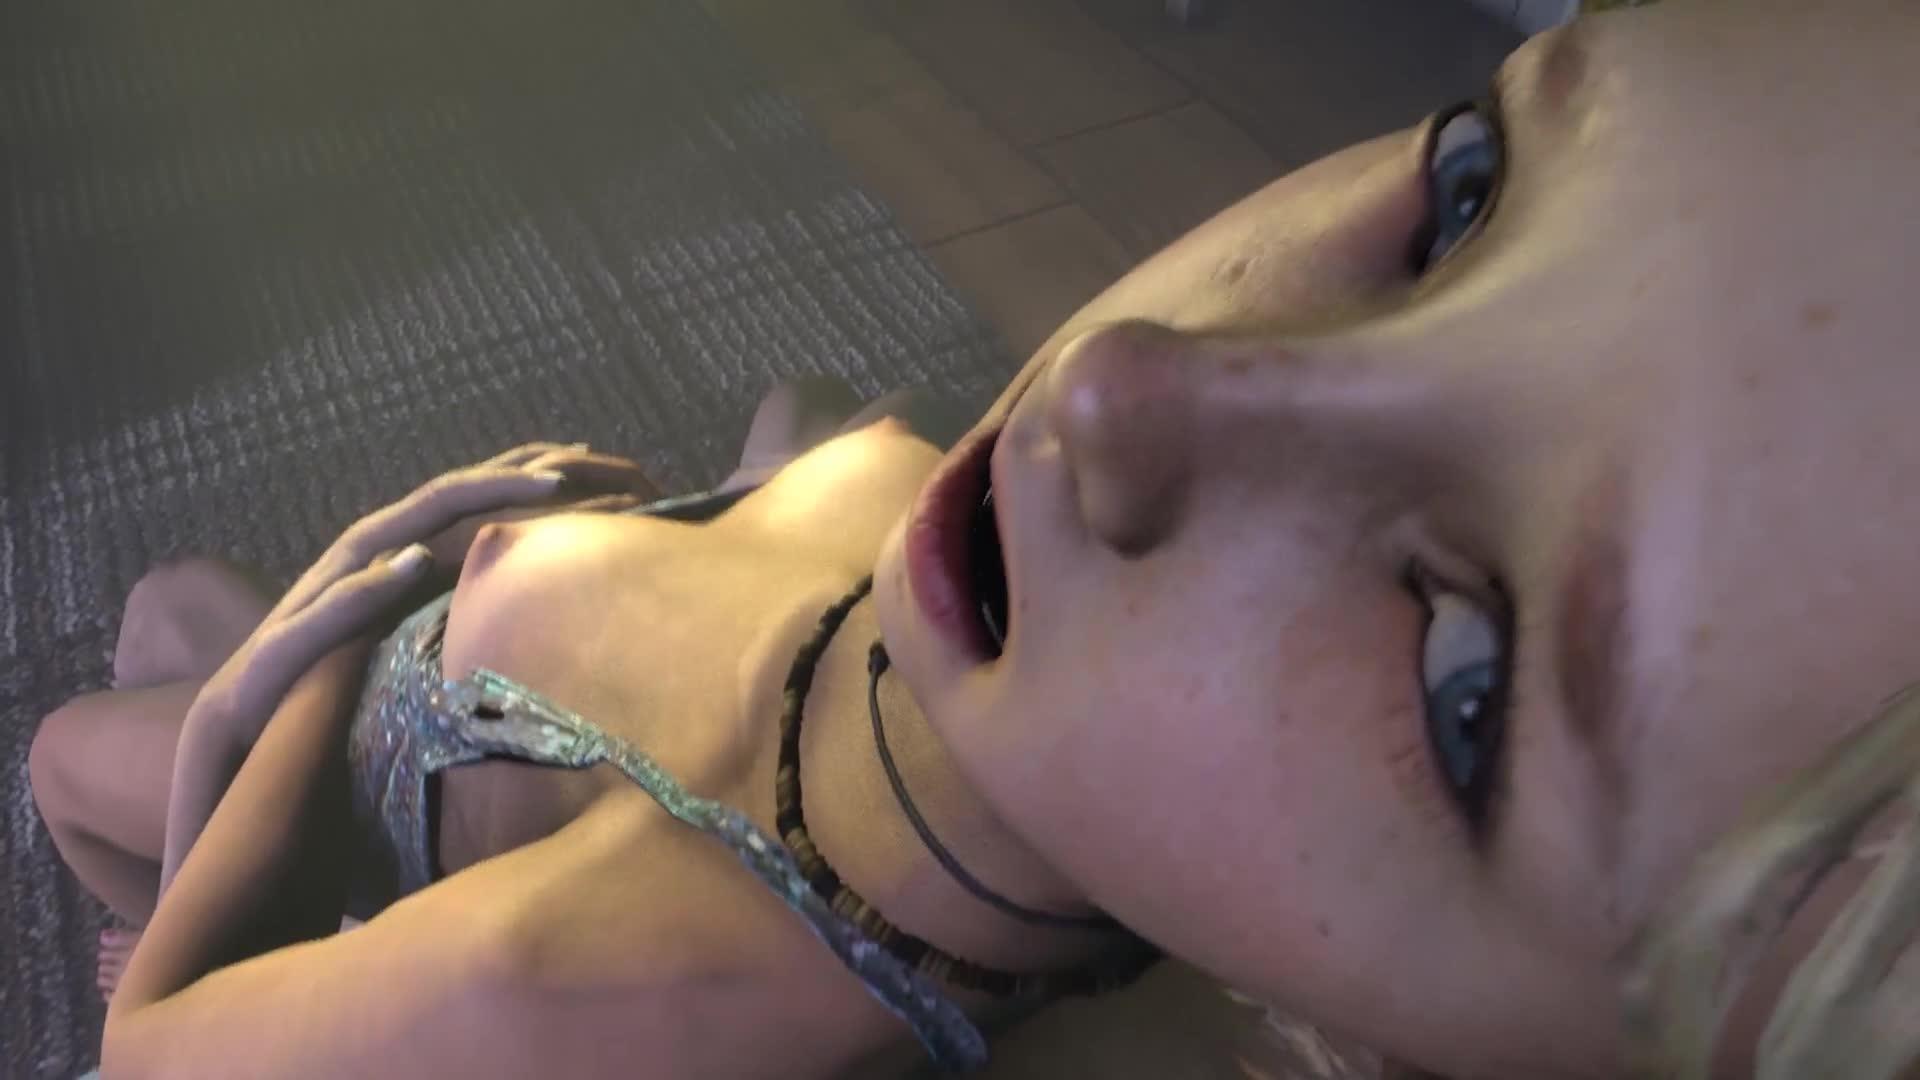 The Last Of Us Sarah Miller Blonde Hair 3d - Lewd.ninja